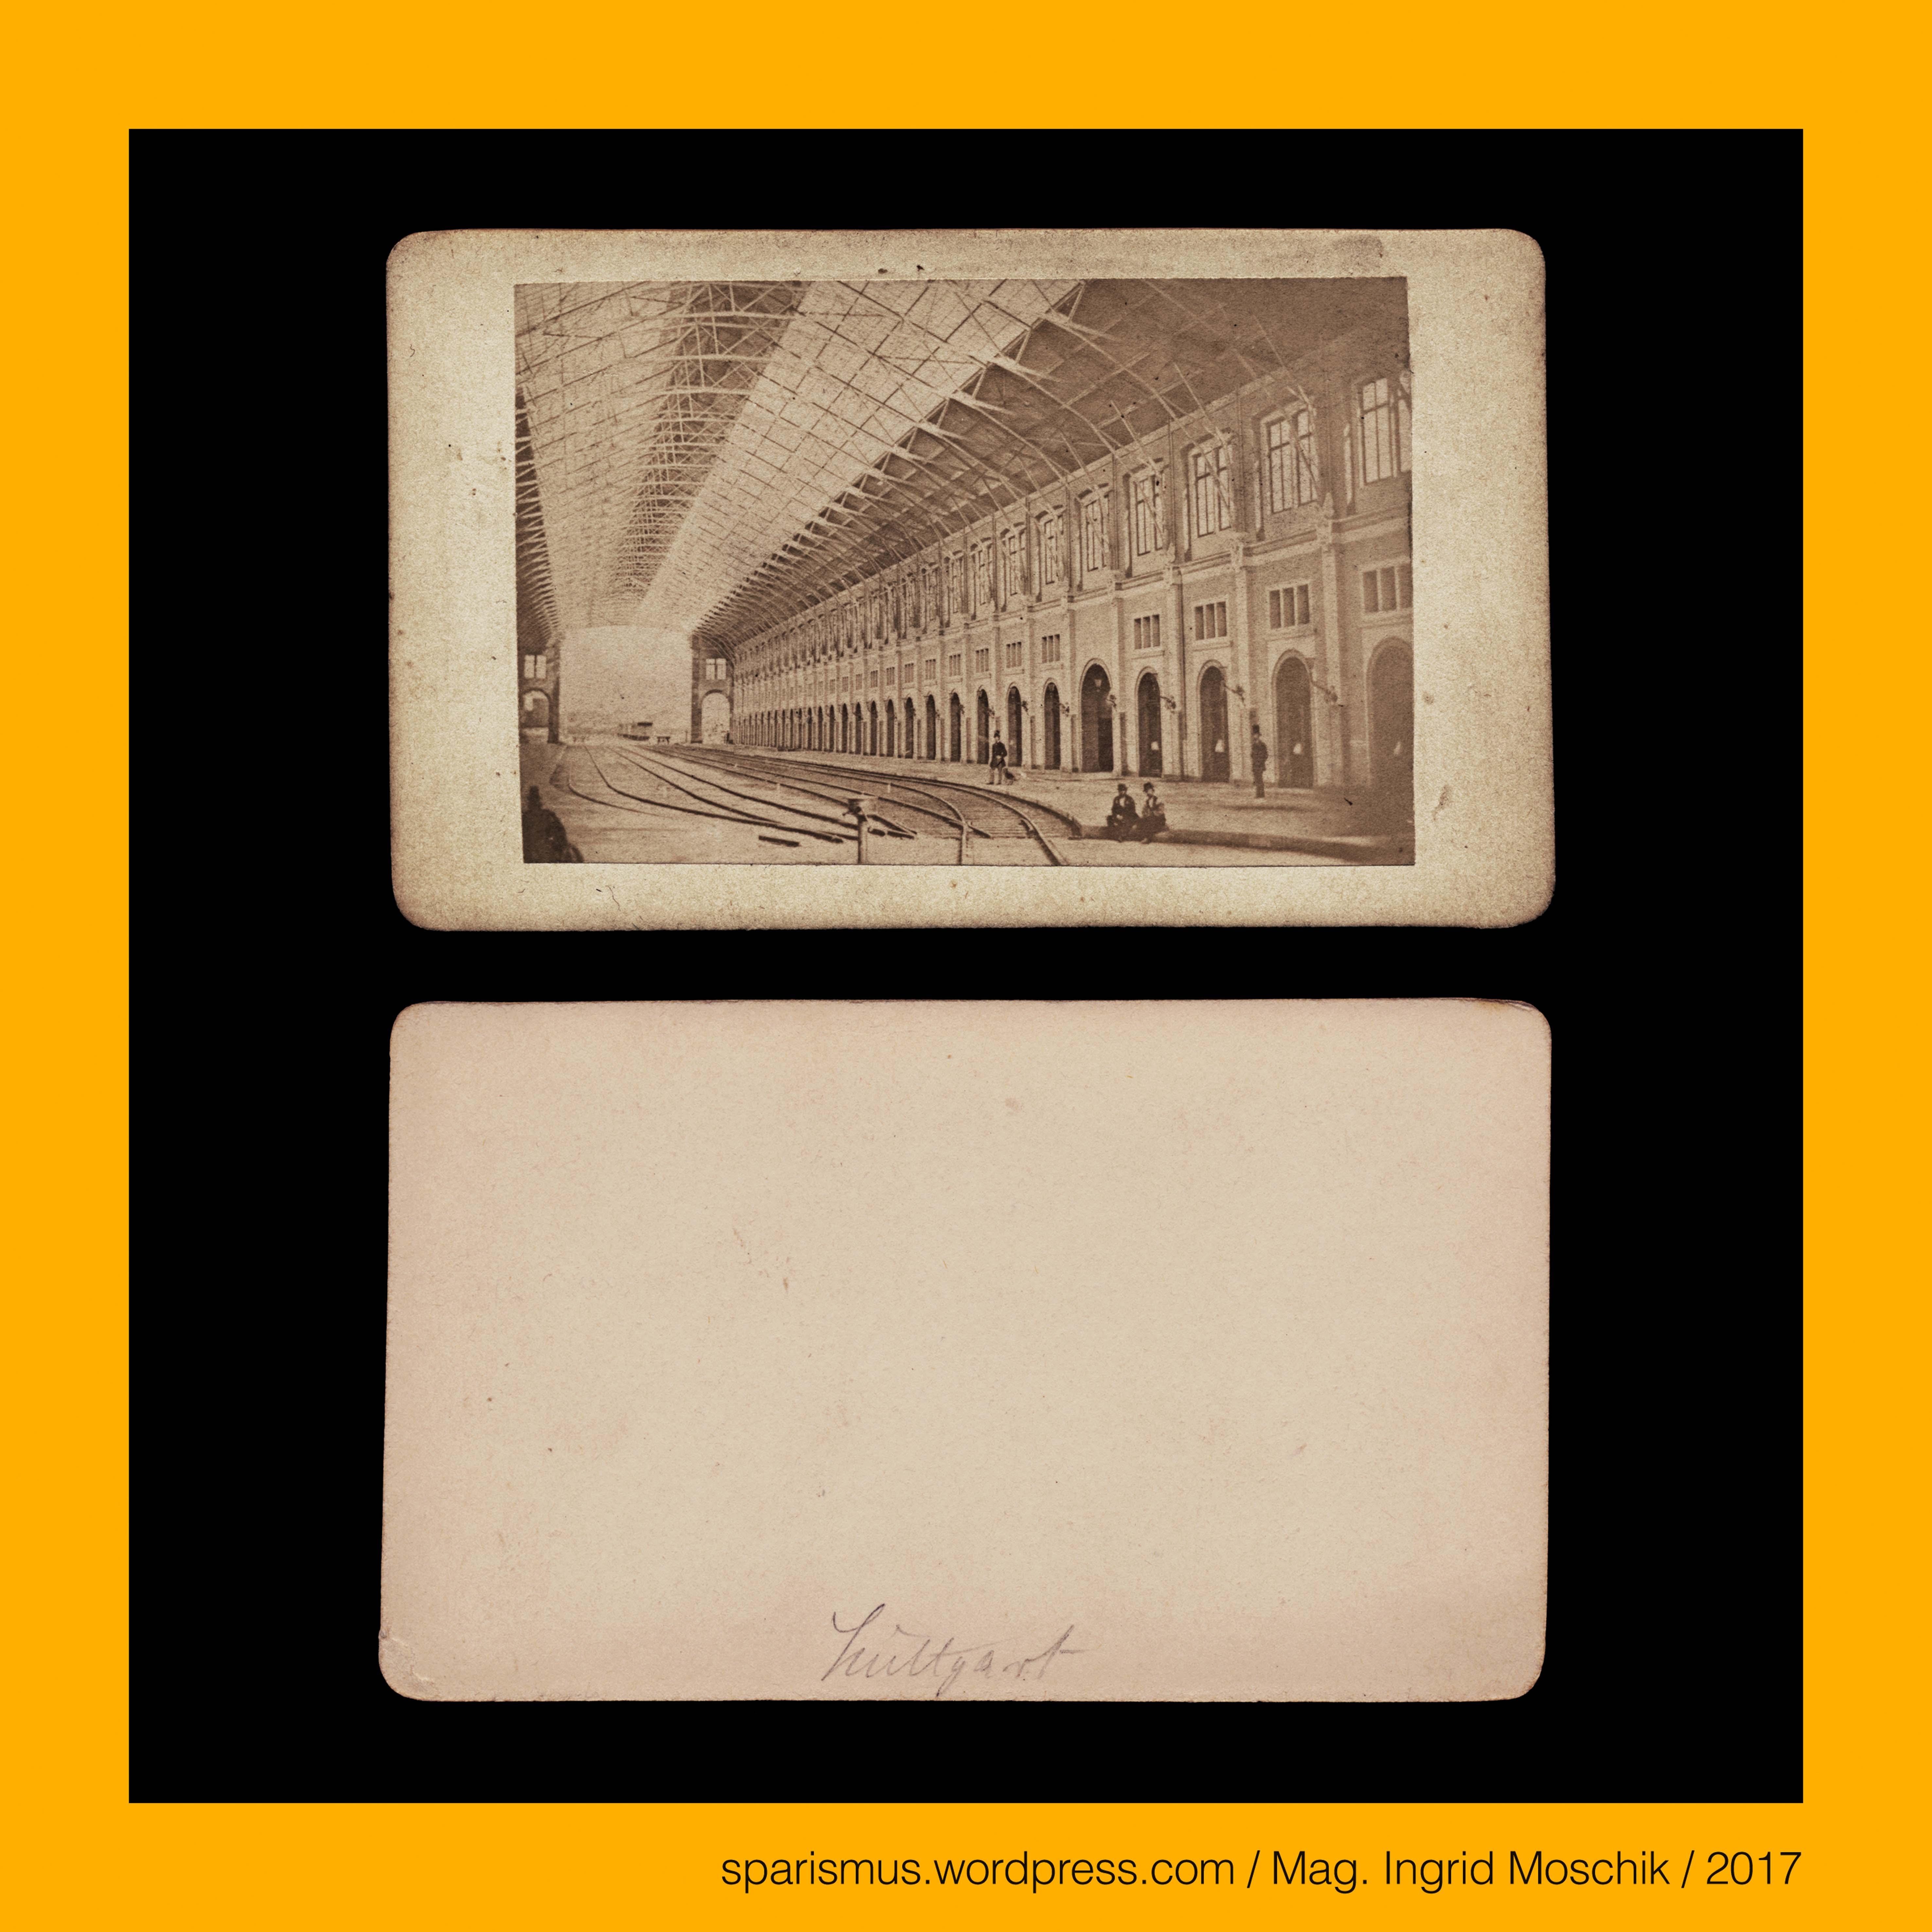 "F. BRANDSEPH – STUTTGART, Georg Friedrich Brandsef – bis 1863, Georg  Friedrich Brandseph. """